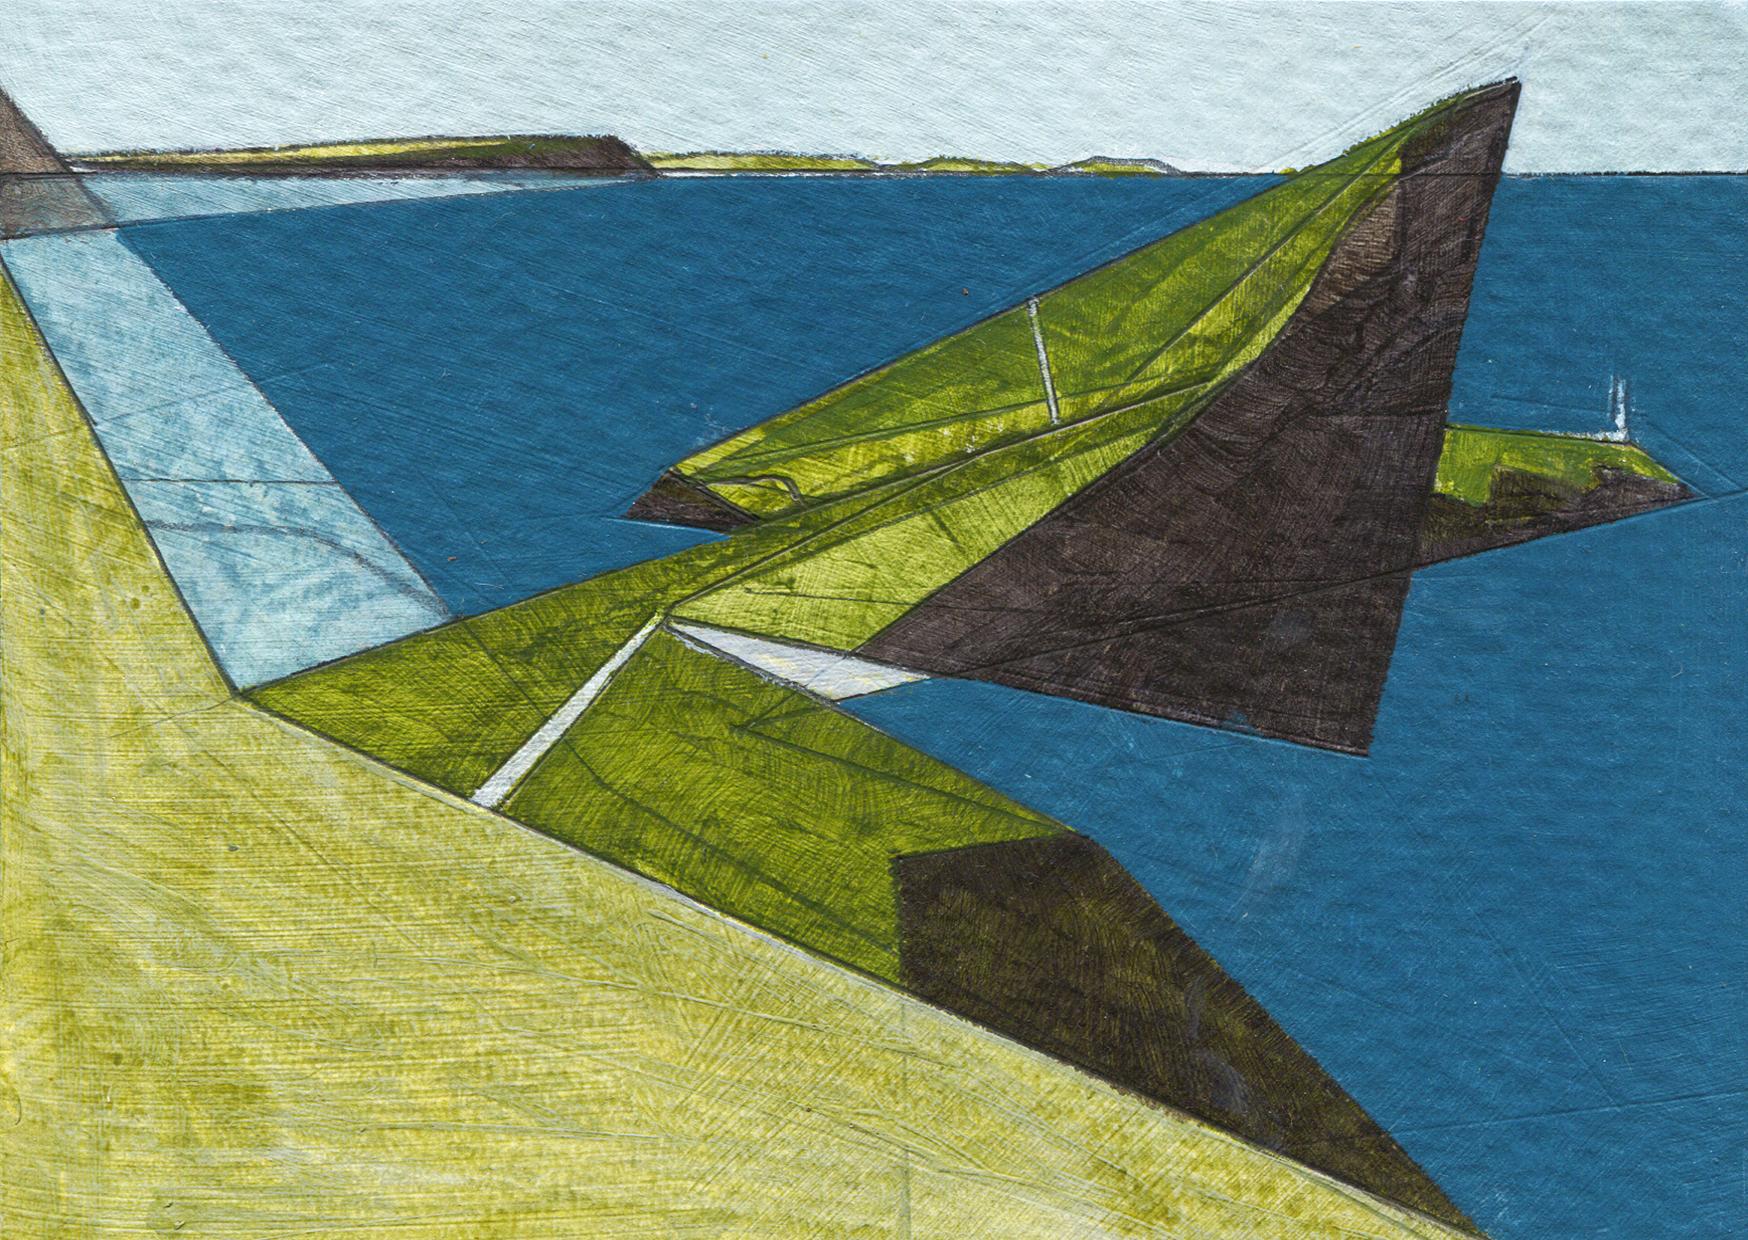 Vanessa Gardiner - Winged Coast (Skye).jpg